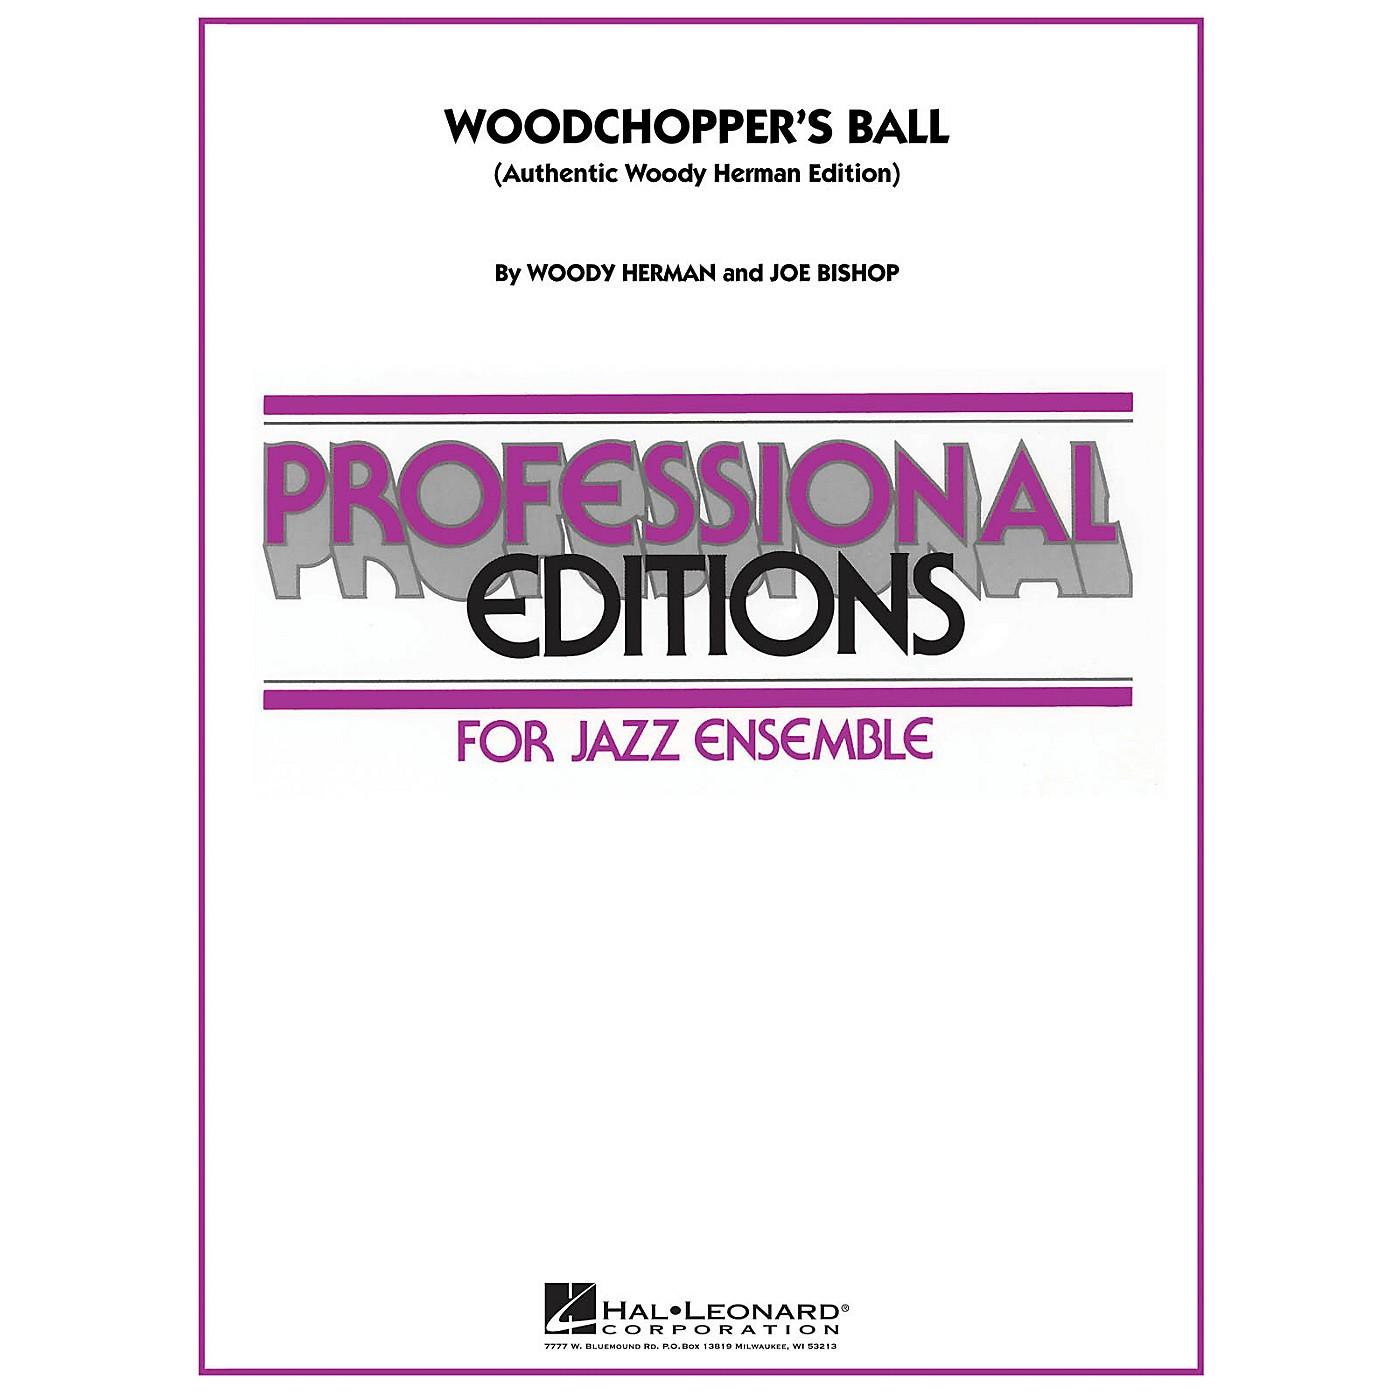 Hal Leonard Woodchopper's Ball (Authentic Woody Herman Edition) Jazz Band Level 5 Arranged by Joe Bishop thumbnail